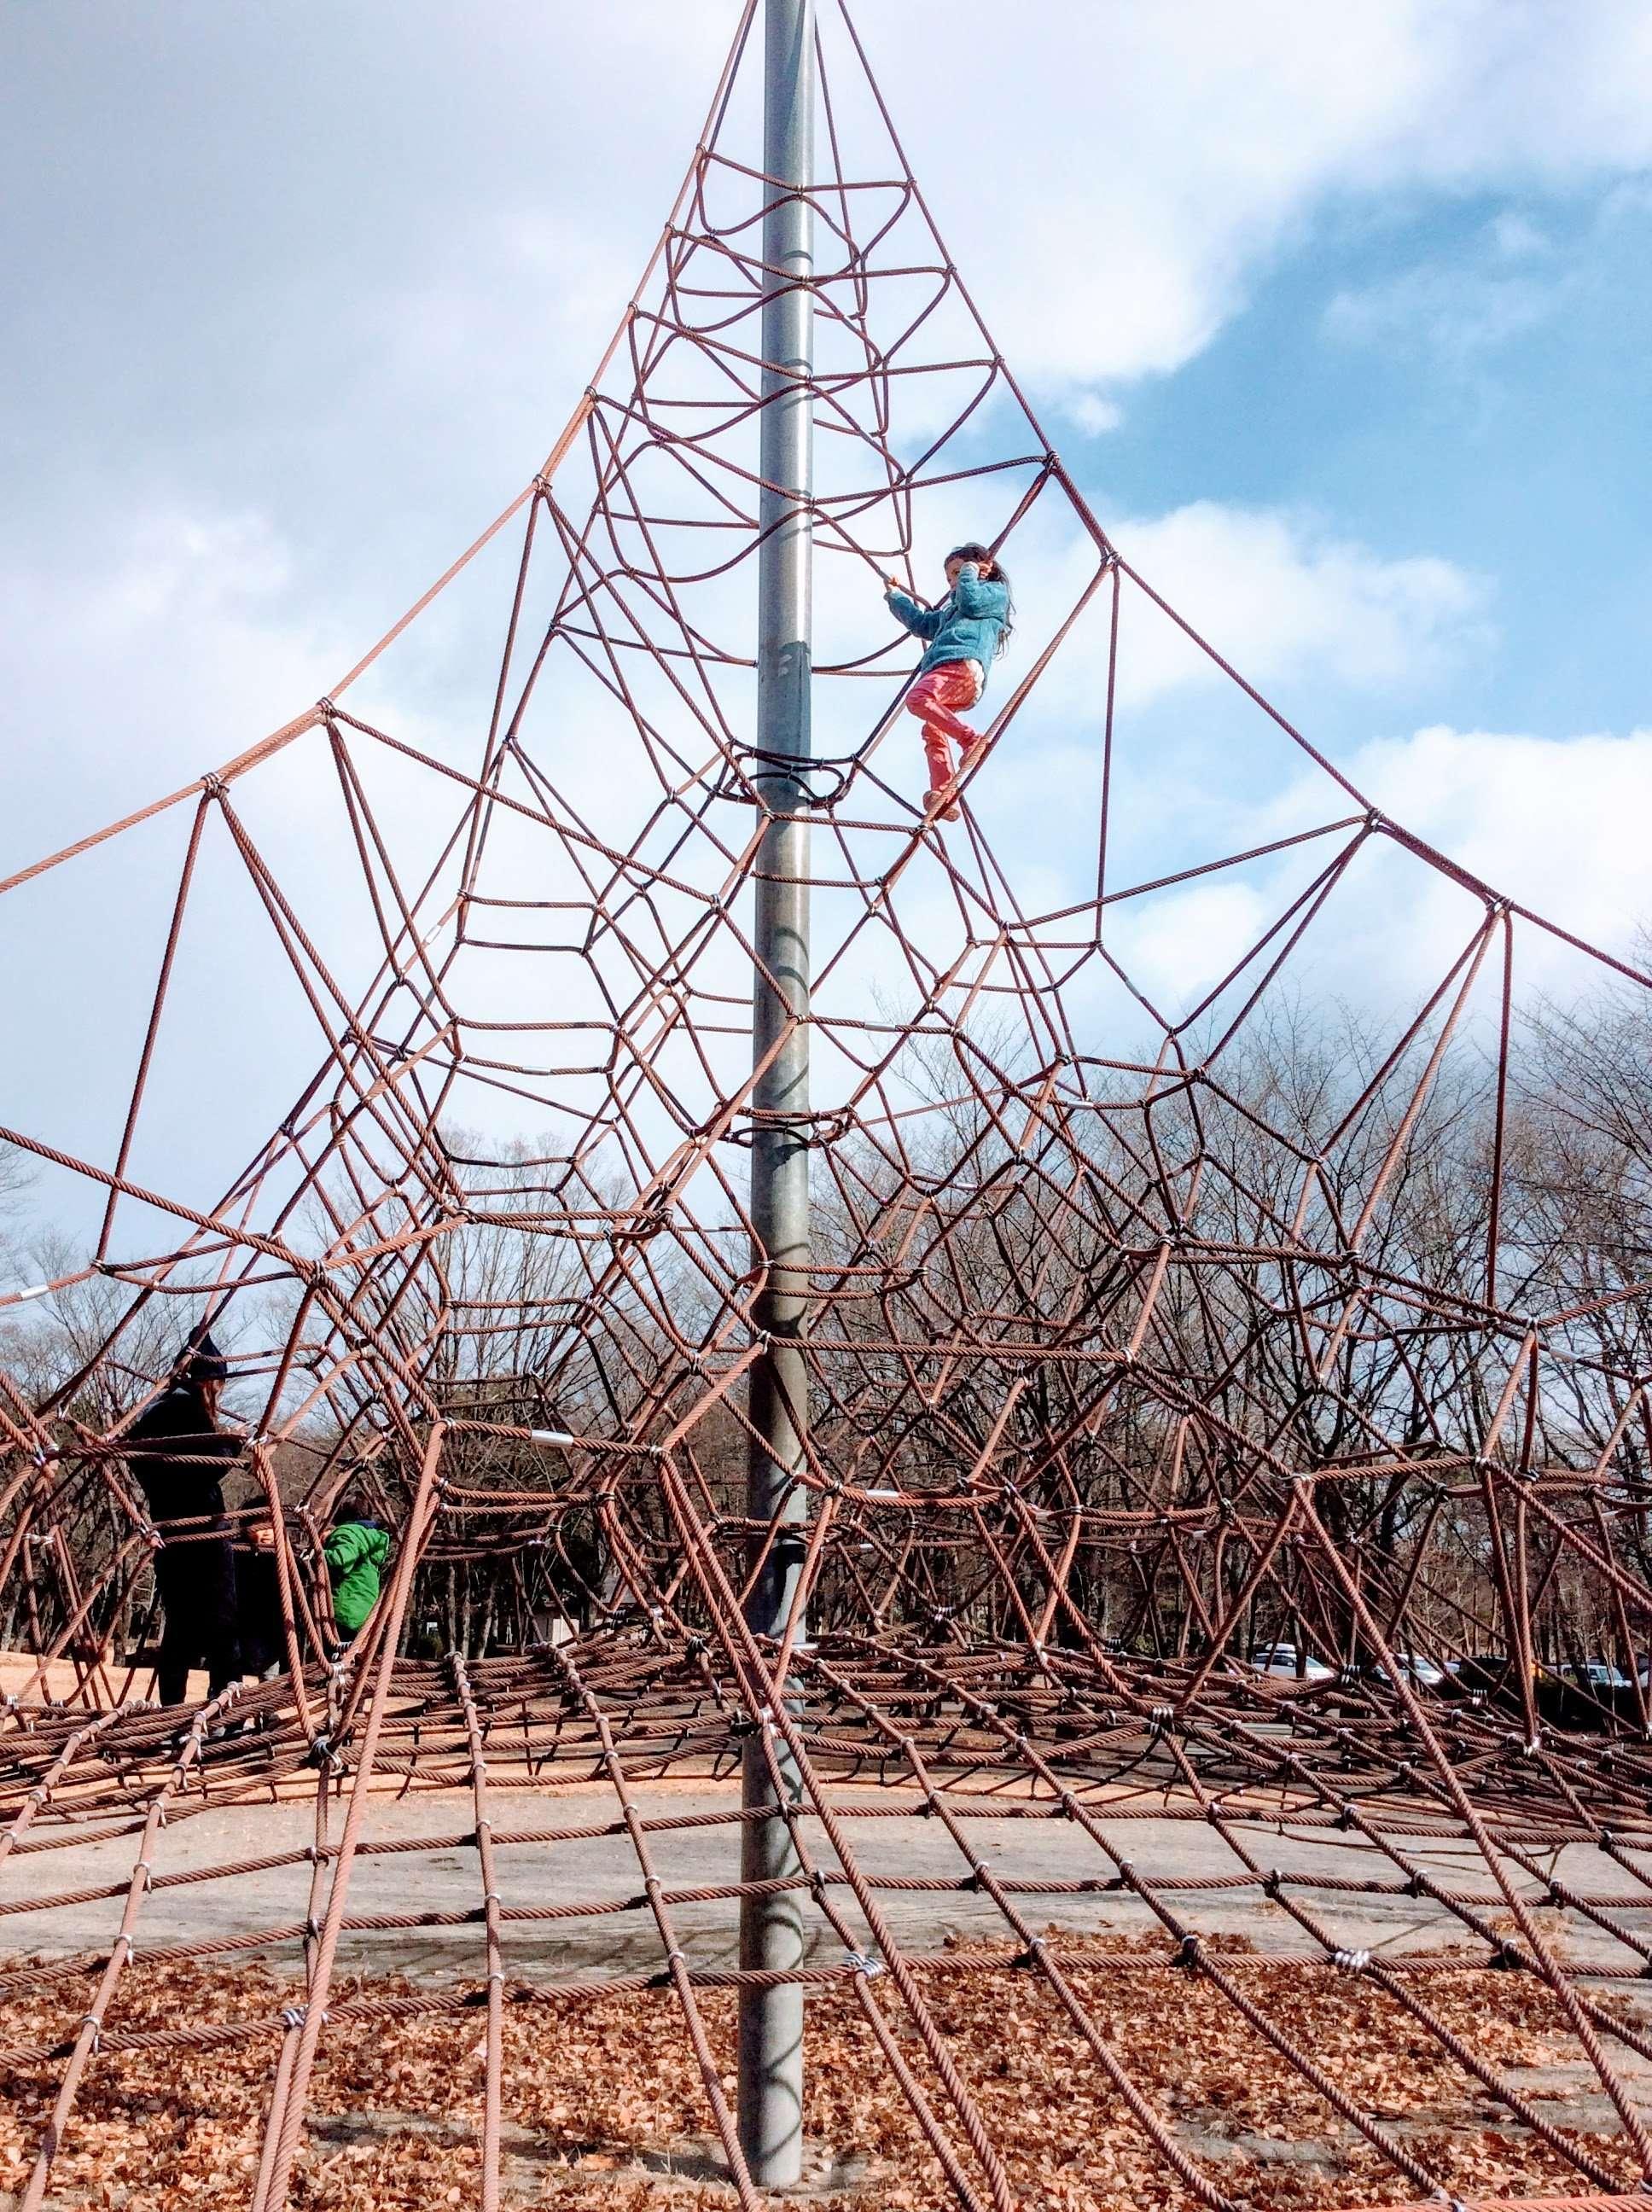 Spider climbing frame at Nasunogahara in Nasushiobara